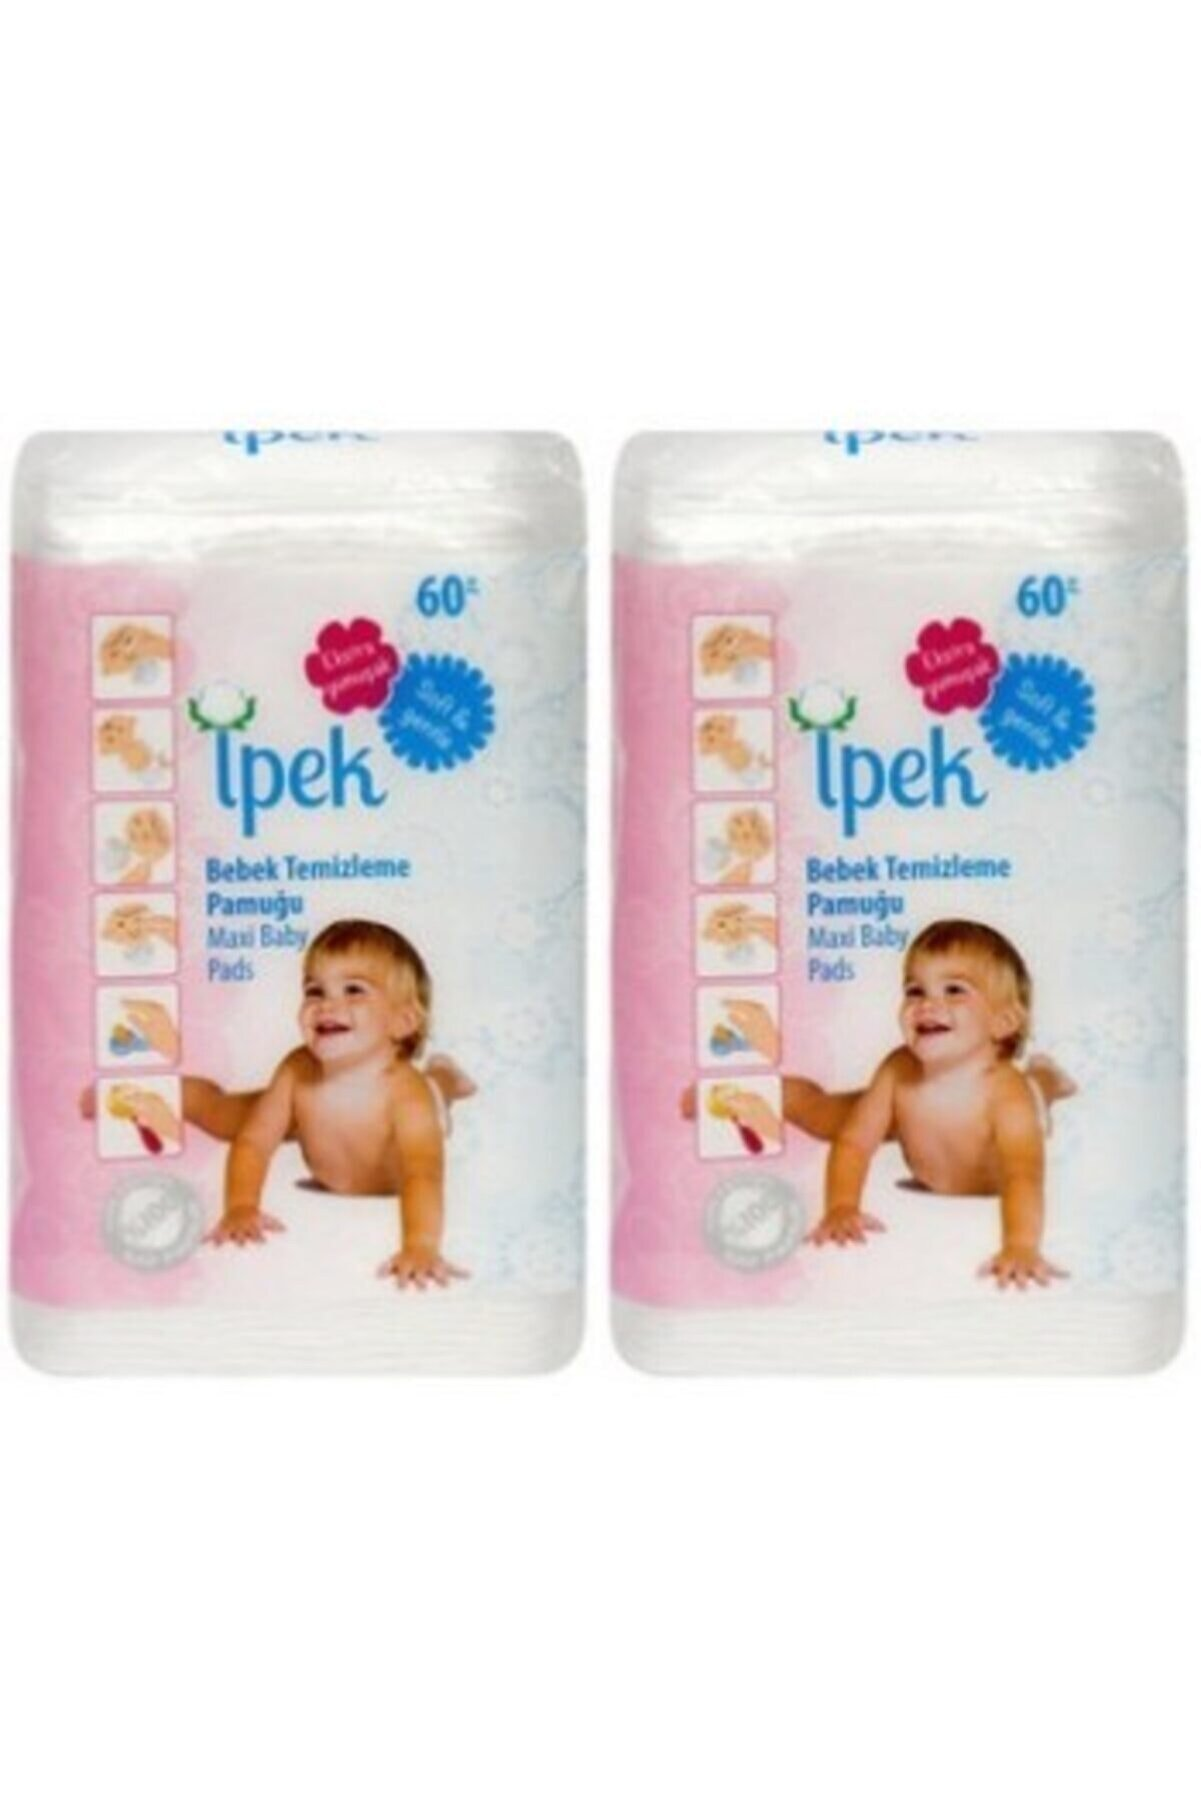 İpek Maxi Bebek Temizleme Pamuğu 60'lı 2 Paket